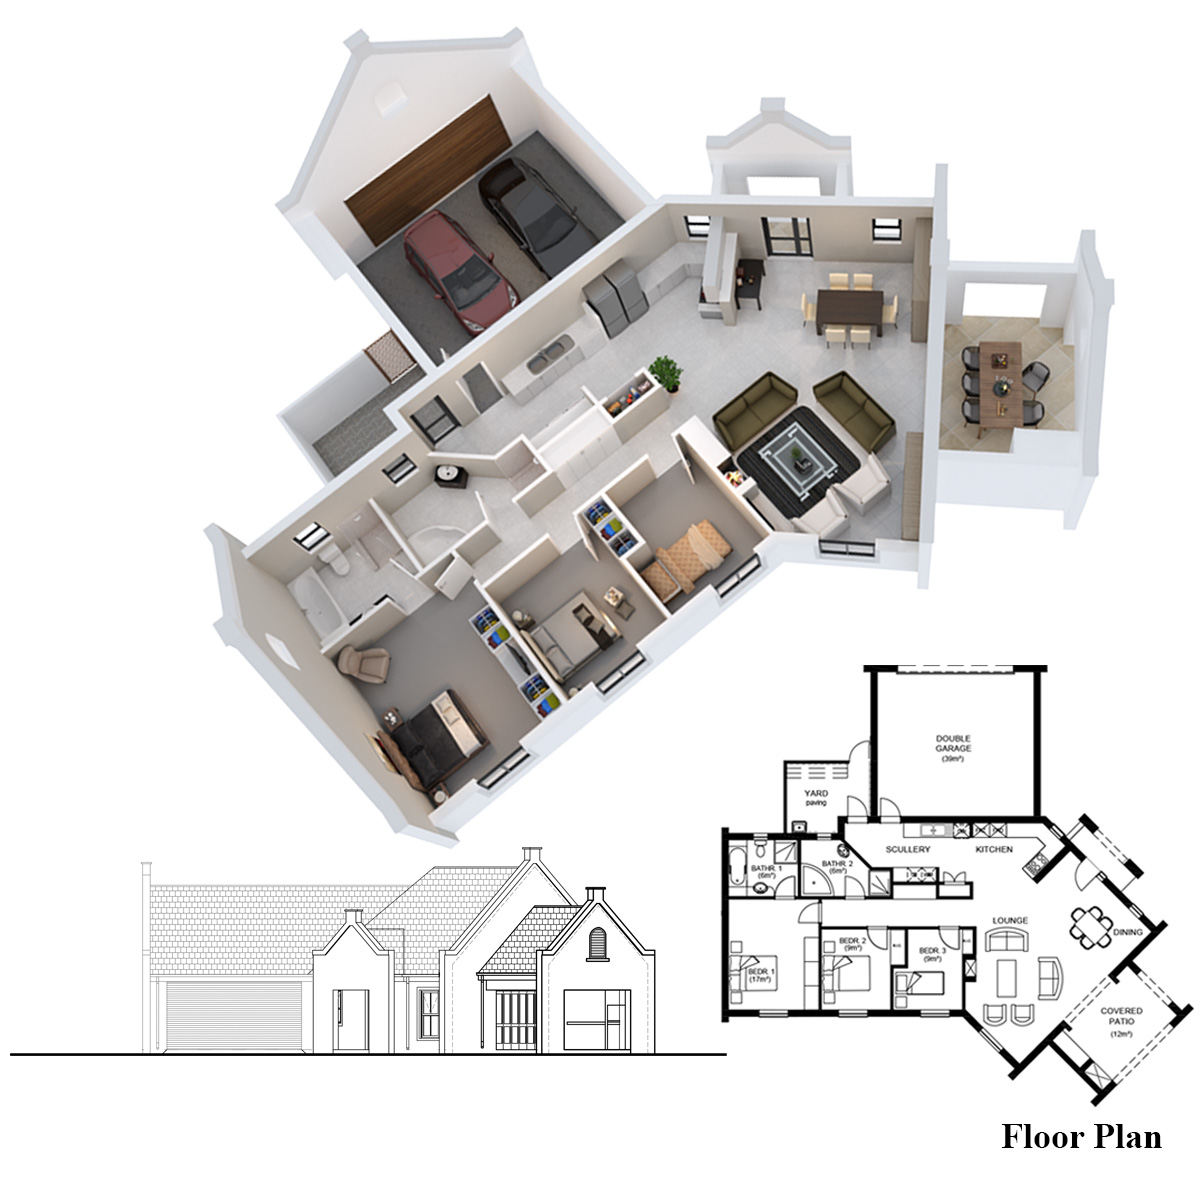 zevenwacht_lifestyle_estate_retirement_home_type-d_1200x1191